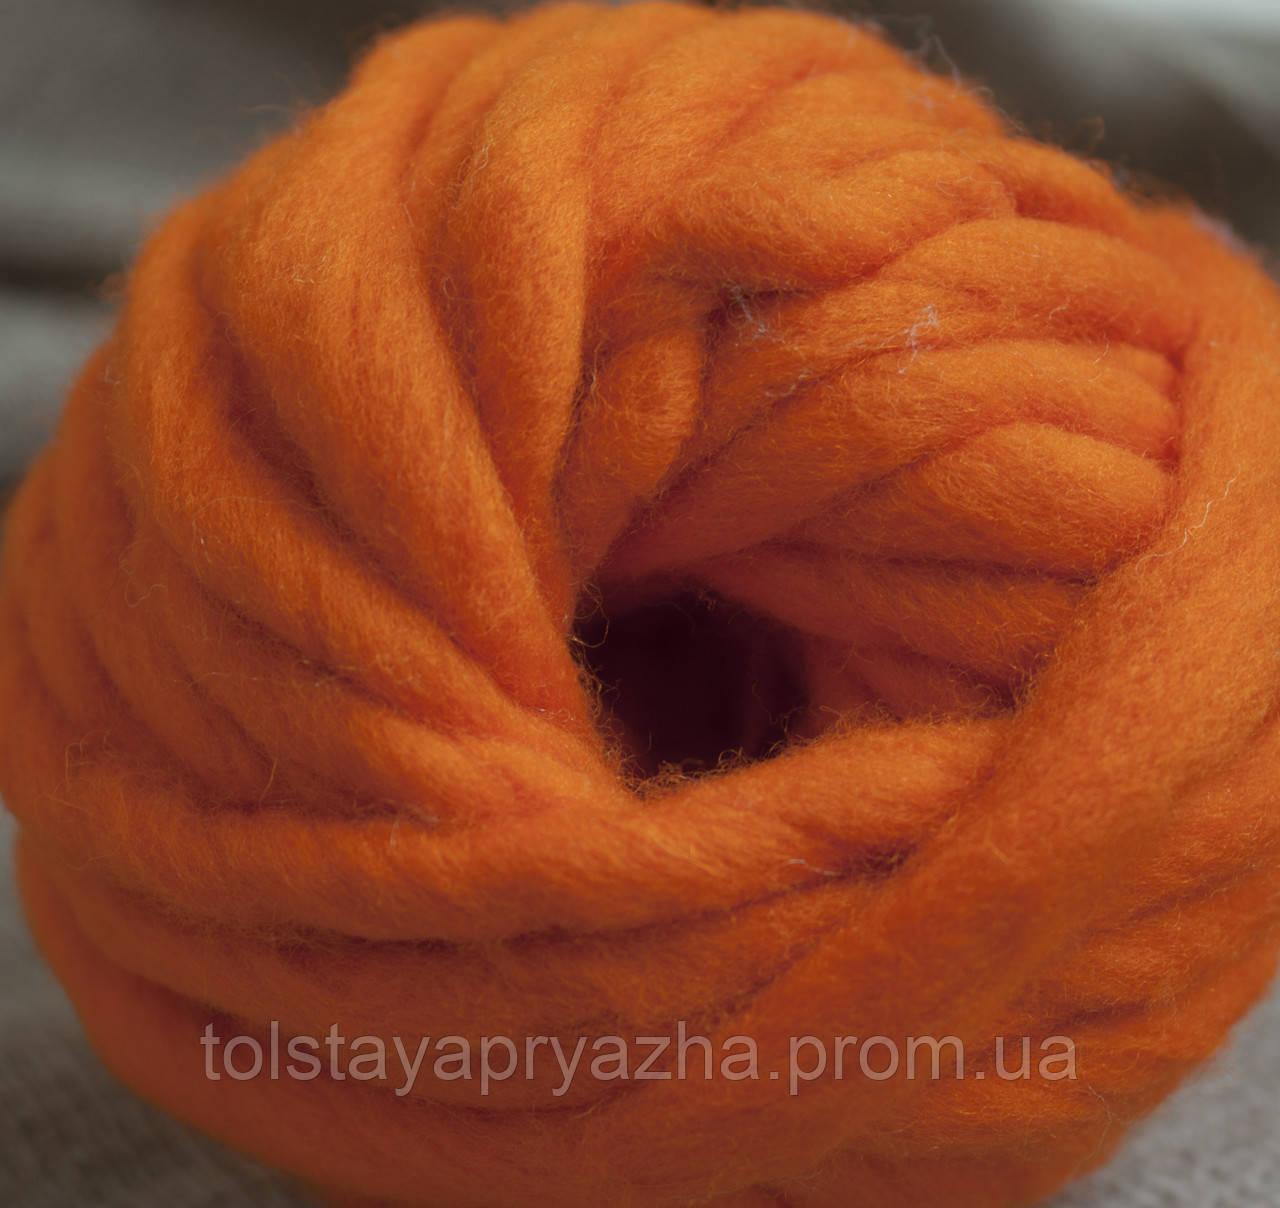 Товста пряжа ручного прядіння Elina Tolina 100% вовна (оброблена) яскравий апельсин